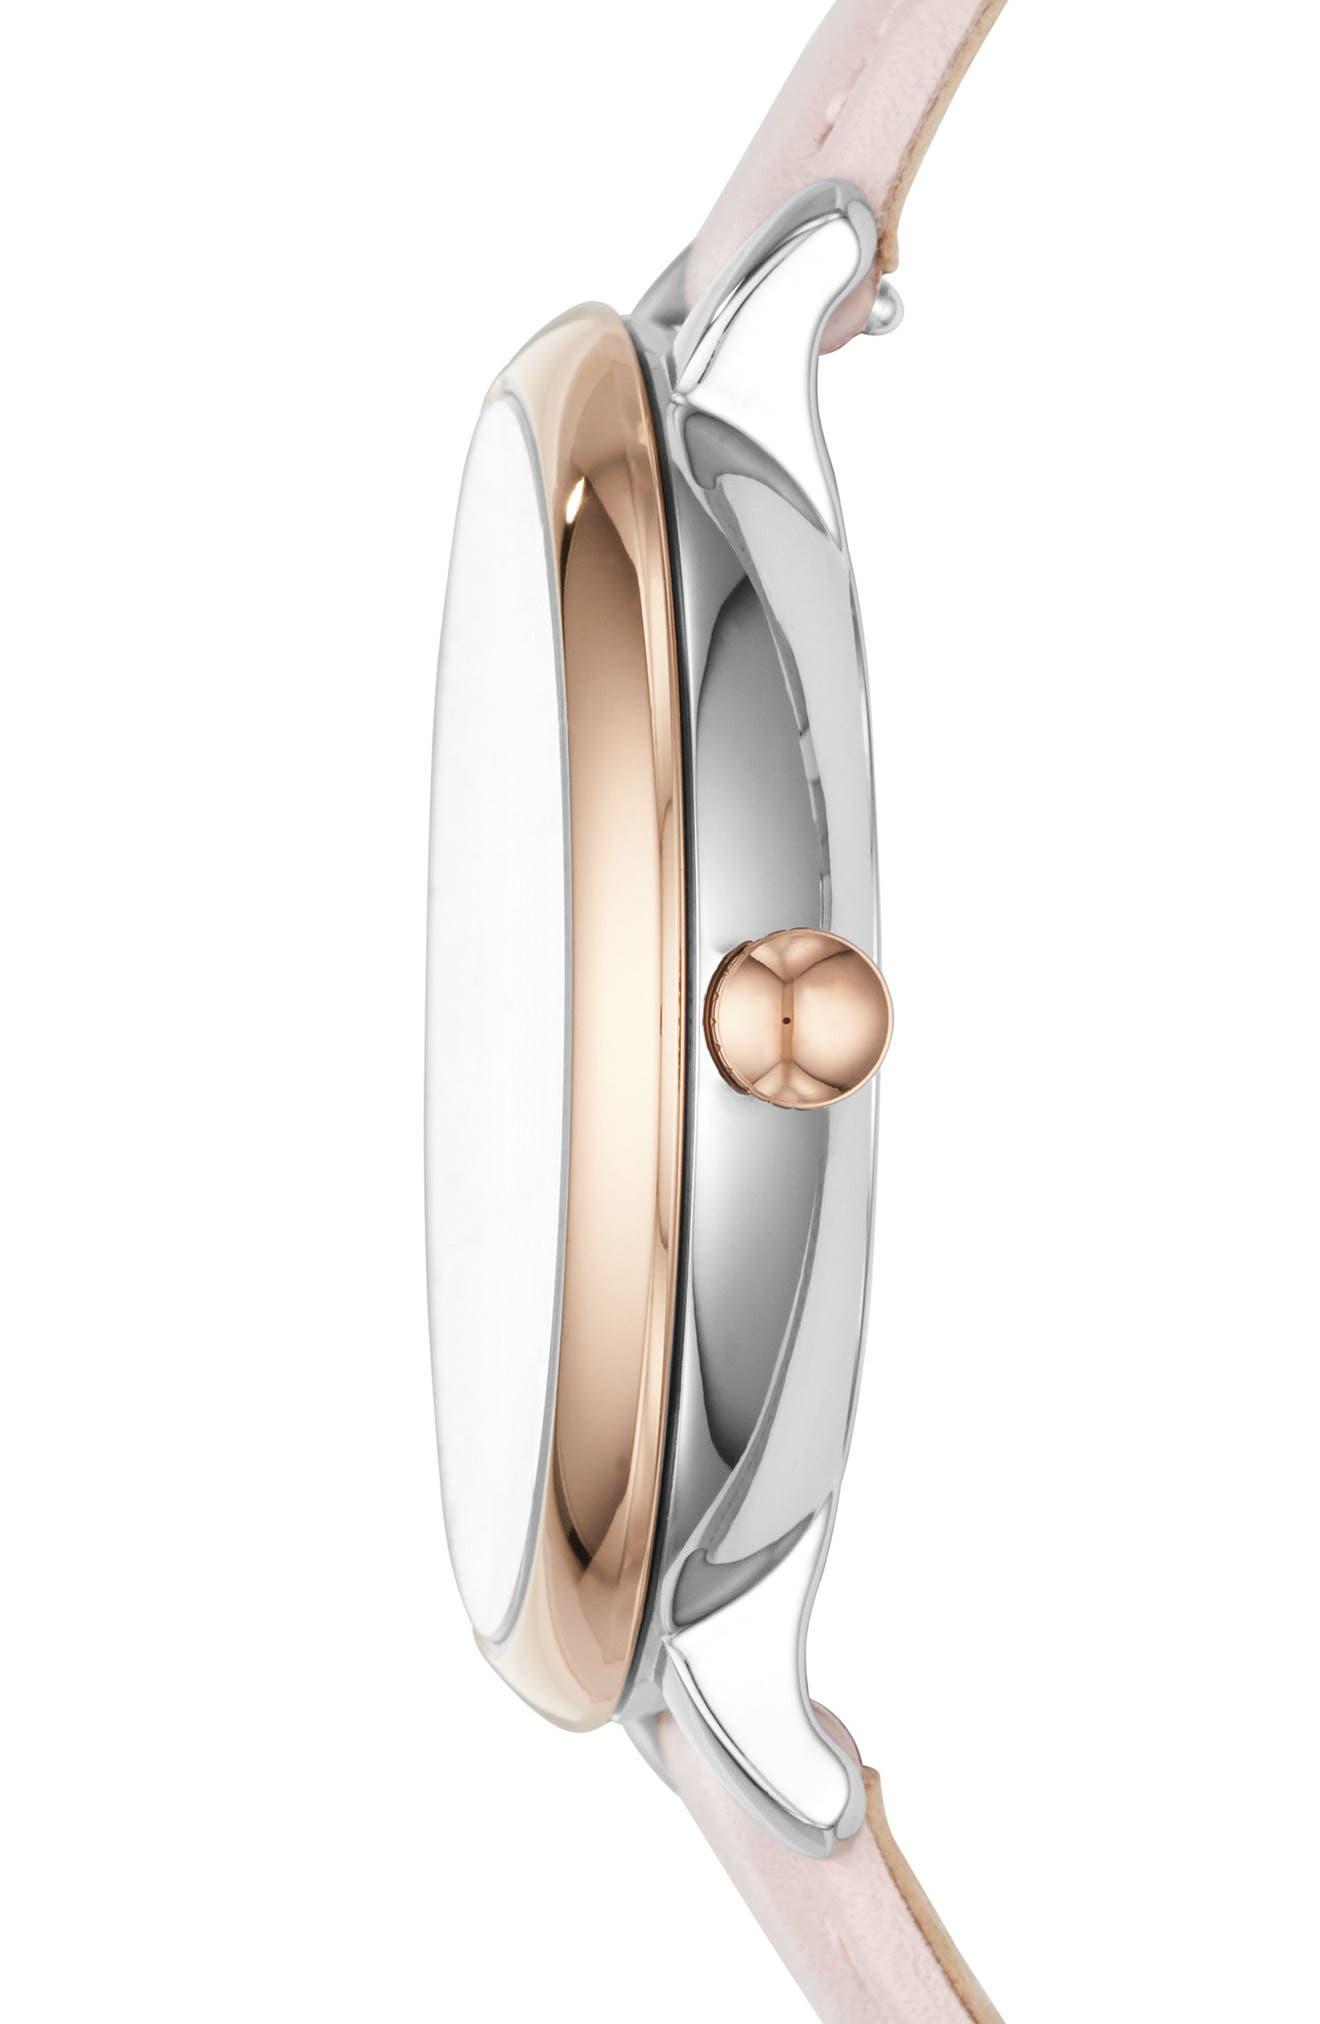 Jacqueline Leather Strap Watch & Bracelet Set, 36mm,                             Alternate thumbnail 2, color,                             Pink/ White/ Rose Gold